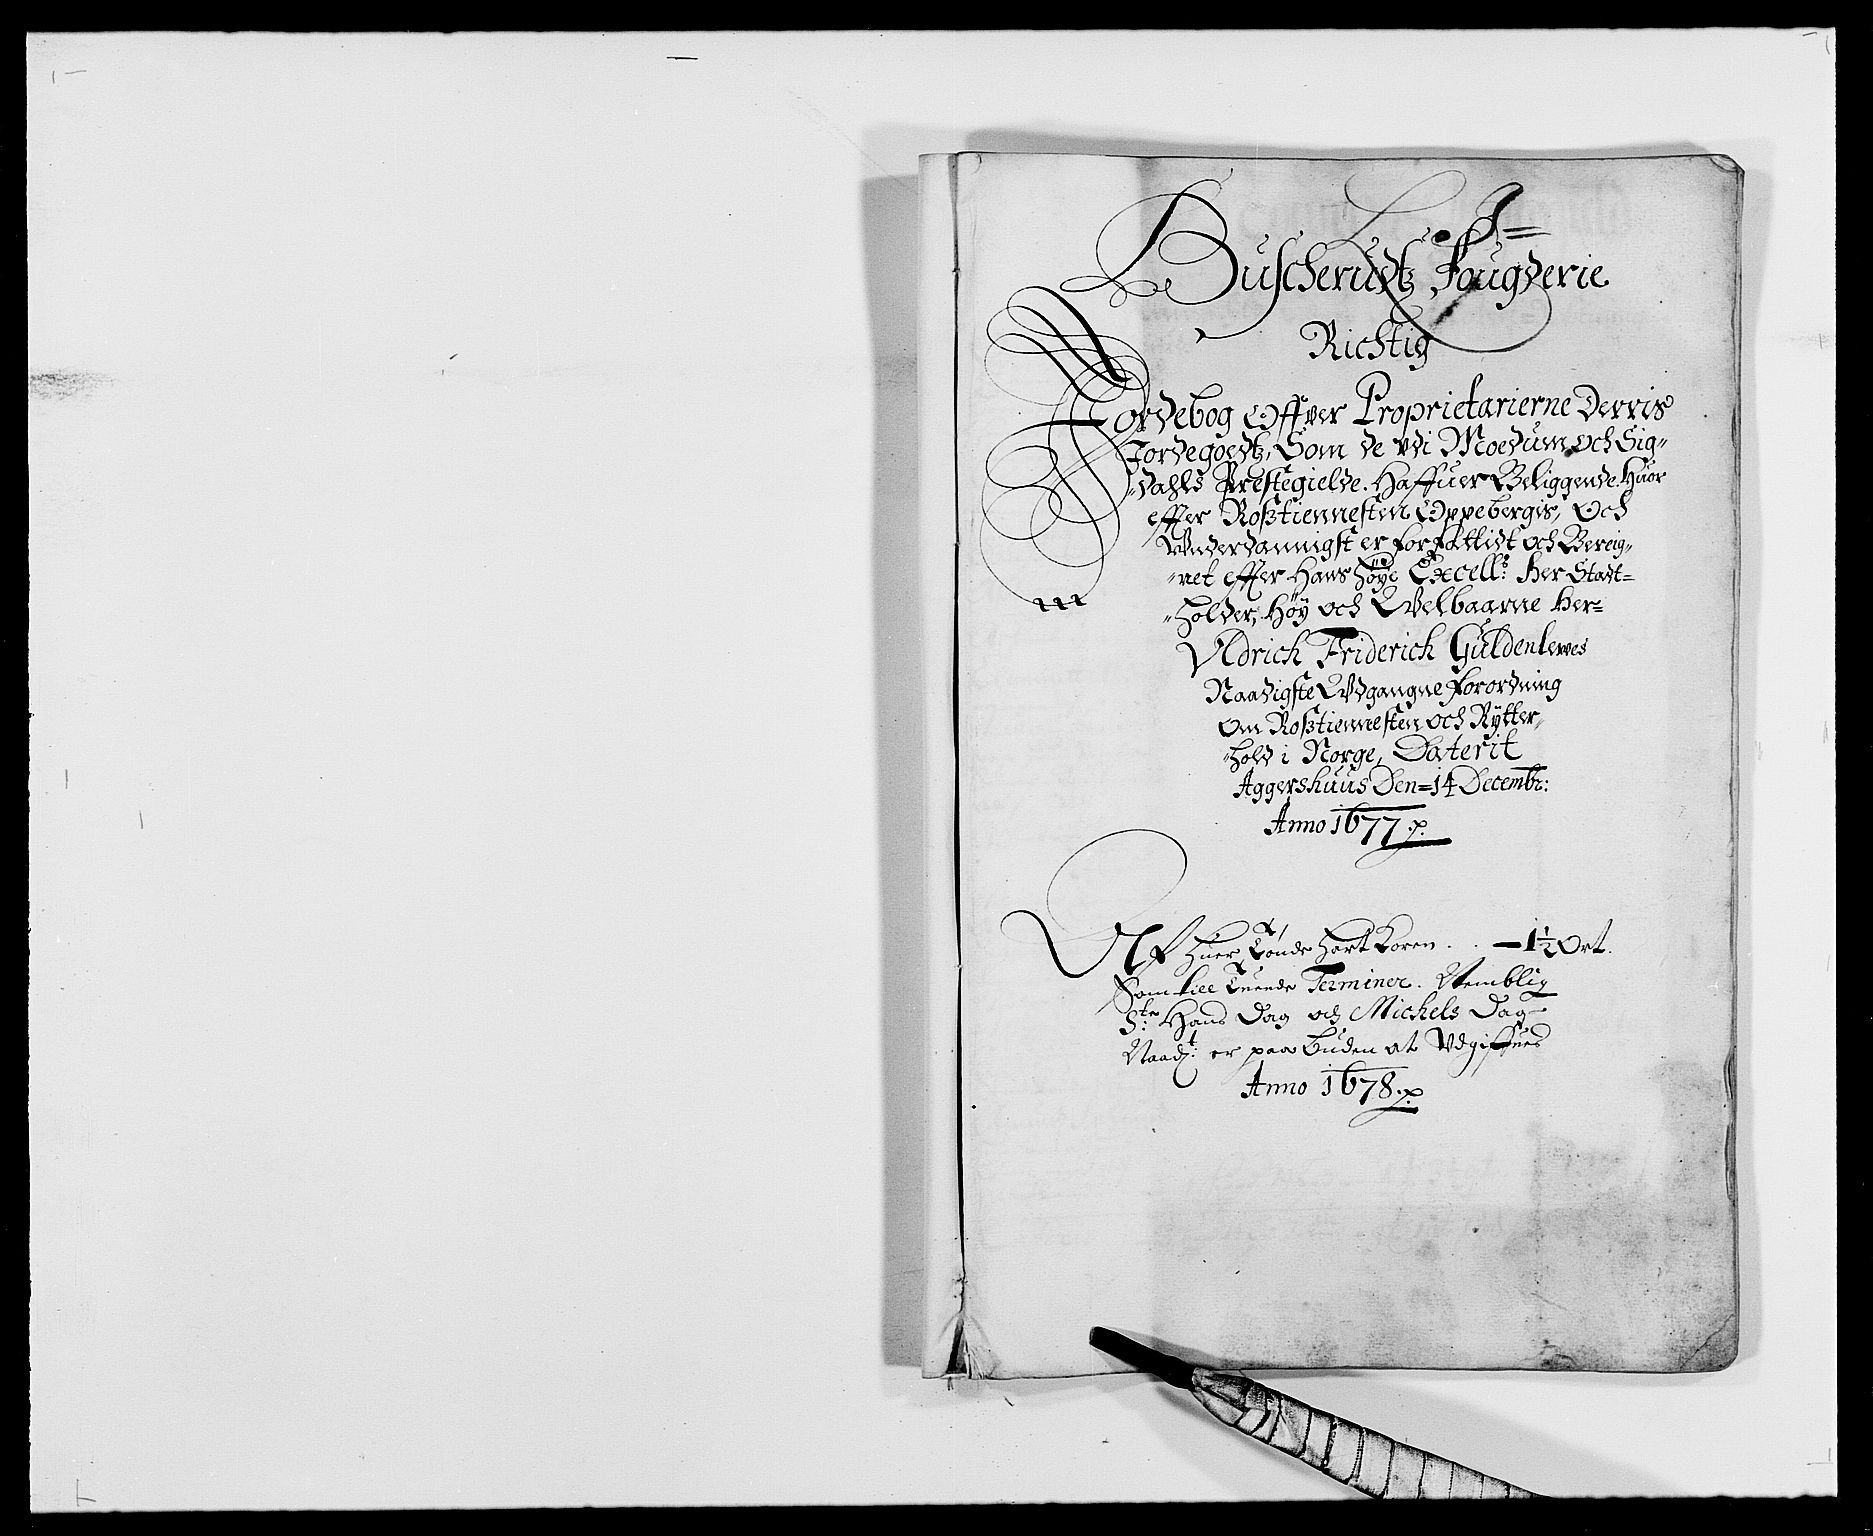 RA, Rentekammeret inntil 1814, Reviderte regnskaper, Fogderegnskap, R25/L1674: Fogderegnskap Buskerud, 1678-1681, s. 165